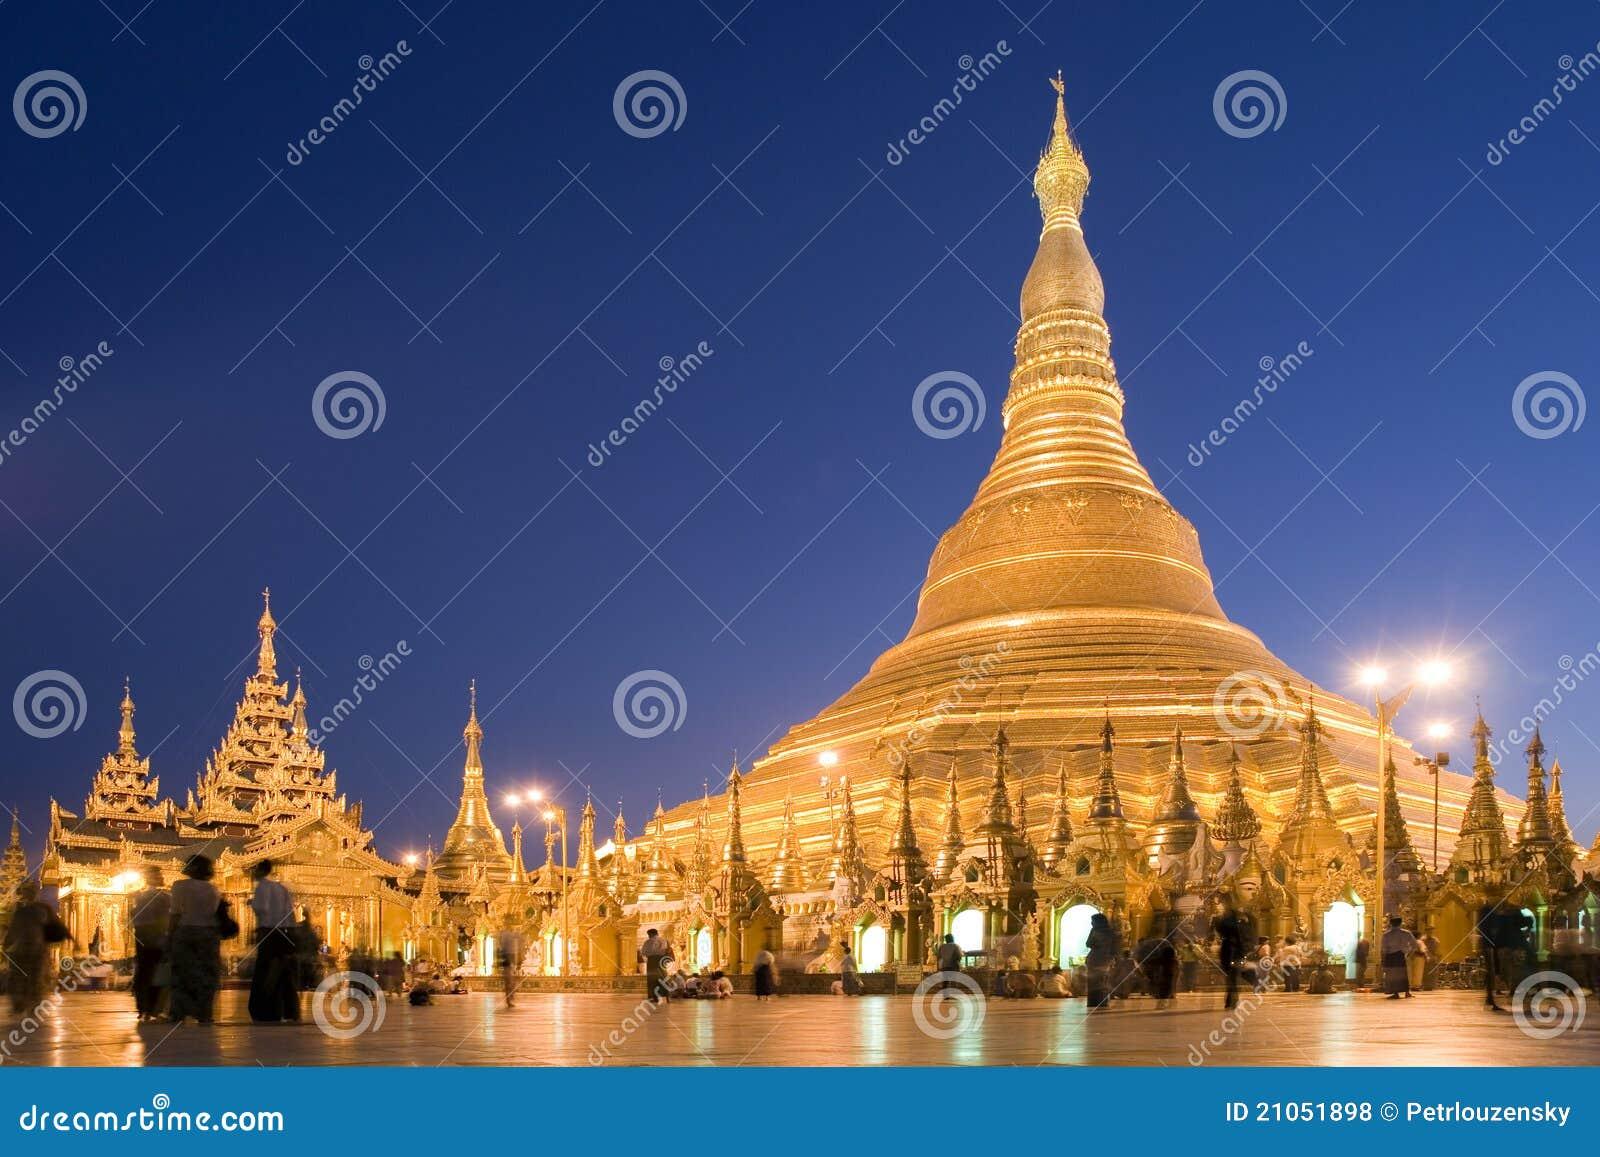 Pagoda di Shwedagon a Yangon, Myanmar (Birmania)